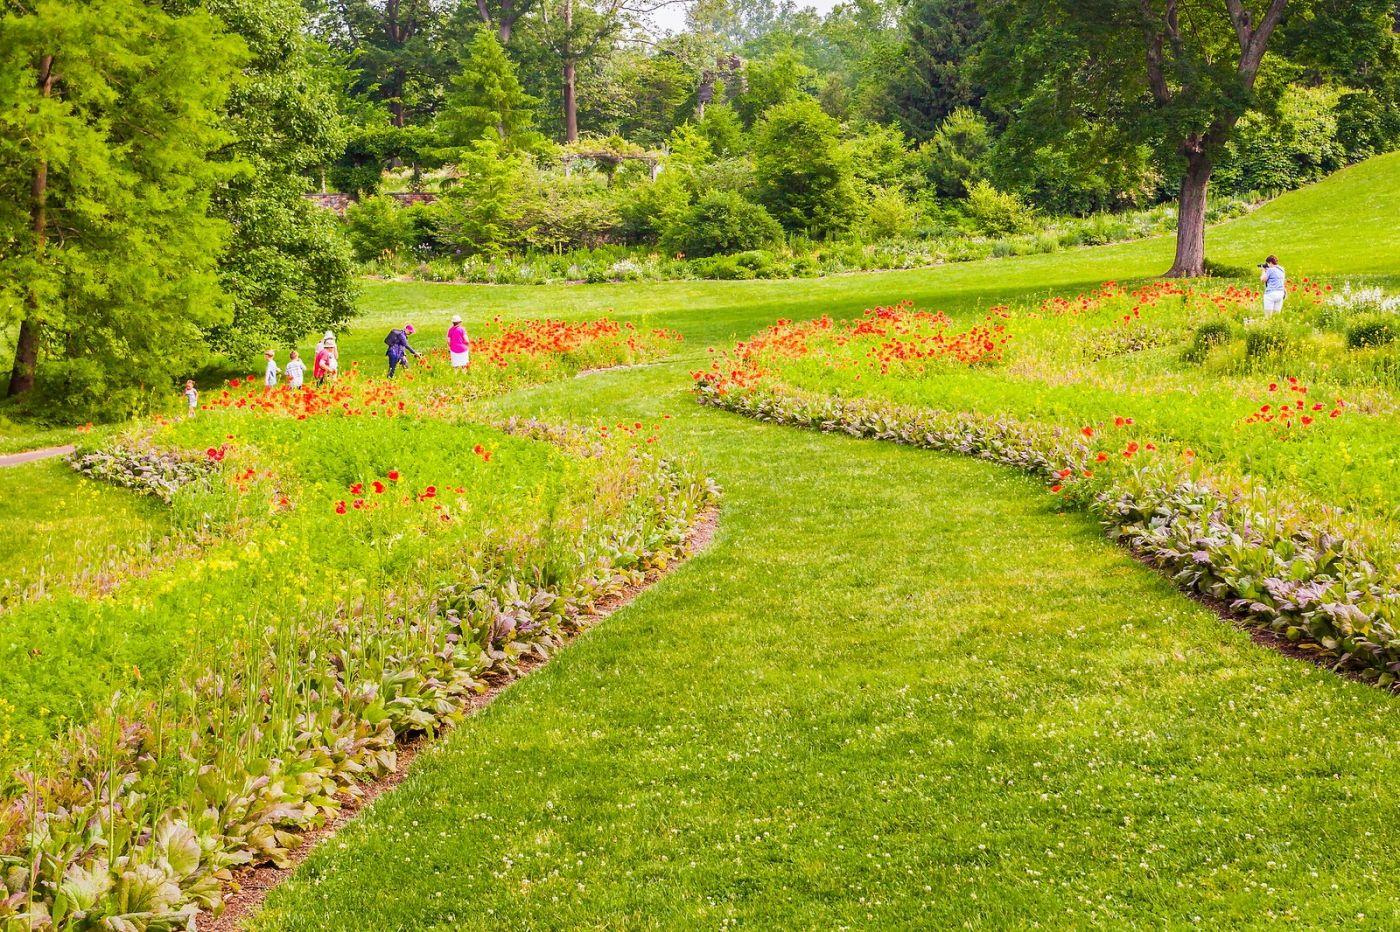 Chanticleer花园,融入自然_图1-17